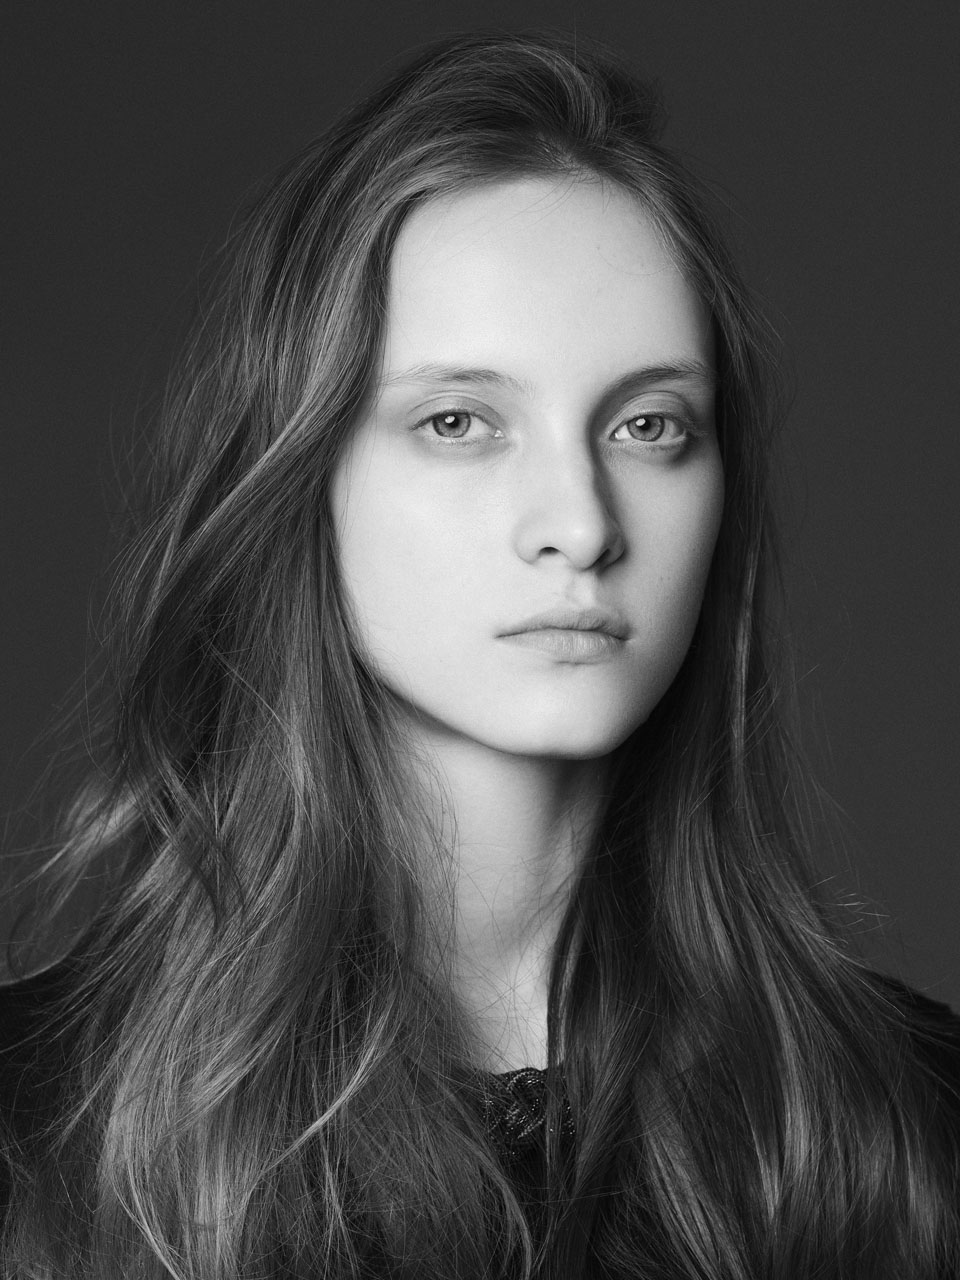 Daria Baranova